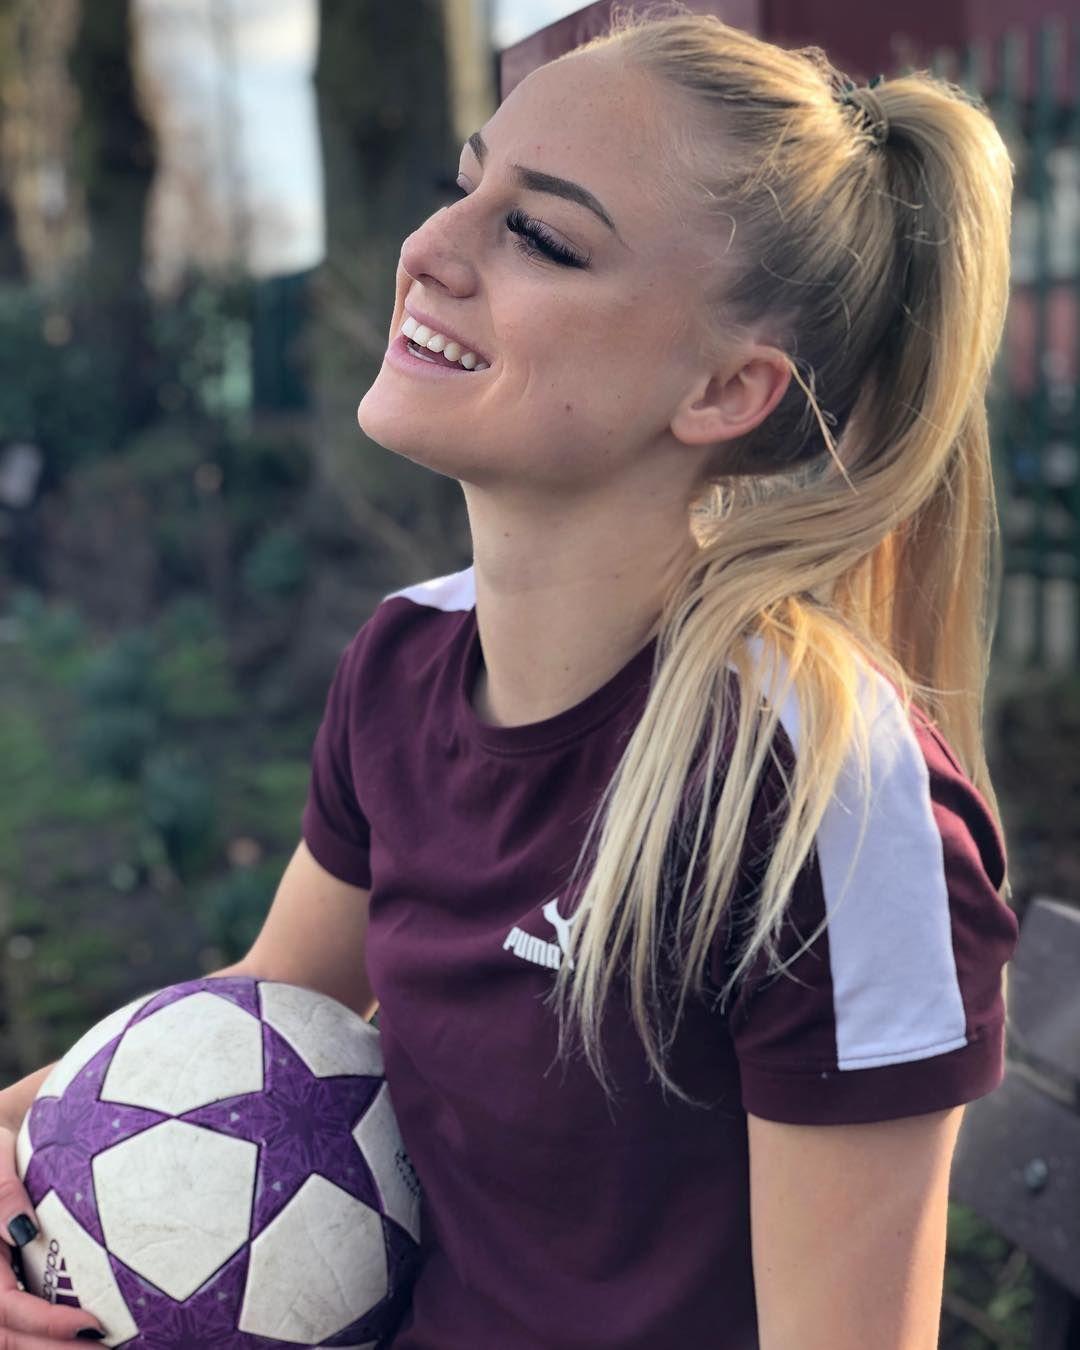 Alisha Lehmann On Instagram Jogadora De Futebol Futebol Feminino Jogadora